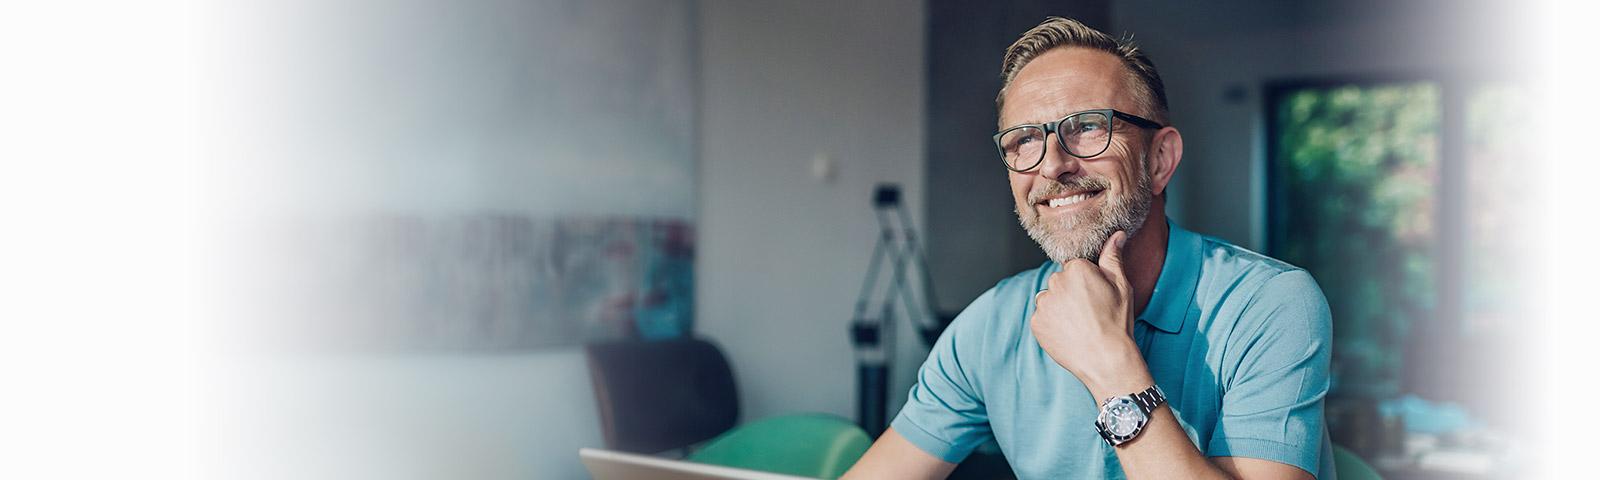 single entrepreneur working at home